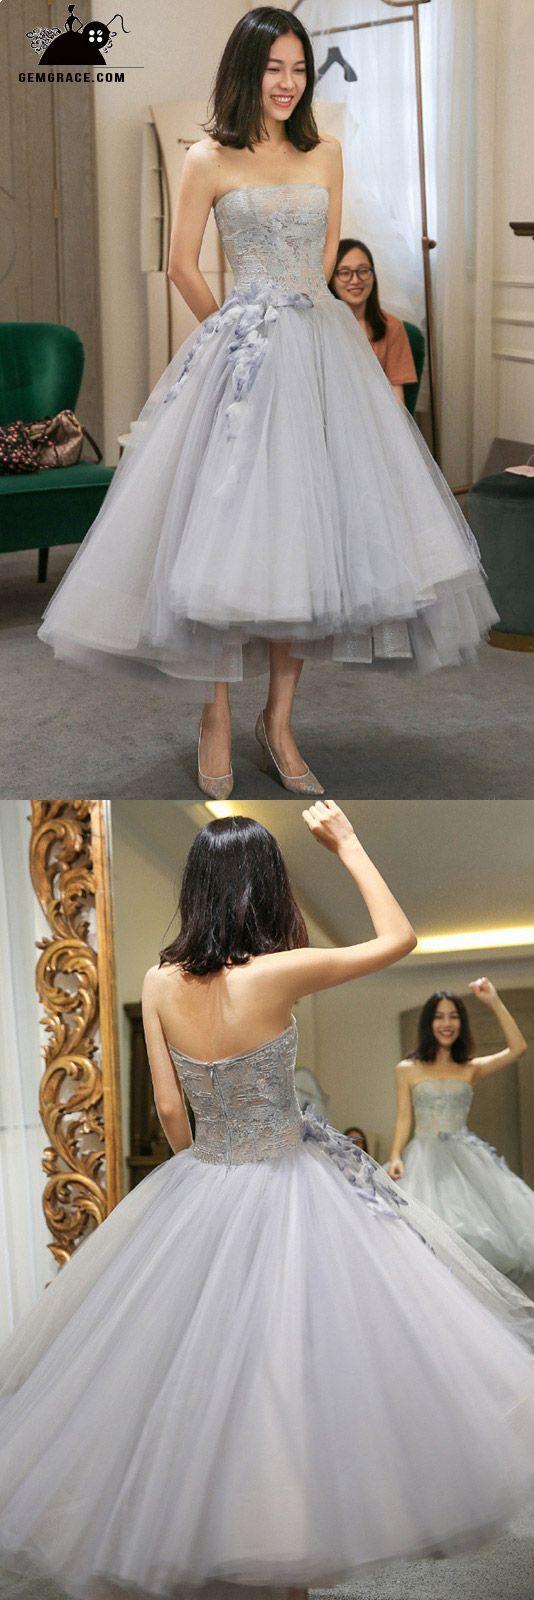 Wedding dresses tea length  High Low Grey Tulle Strapless Wedding Party Dress Tea Length with